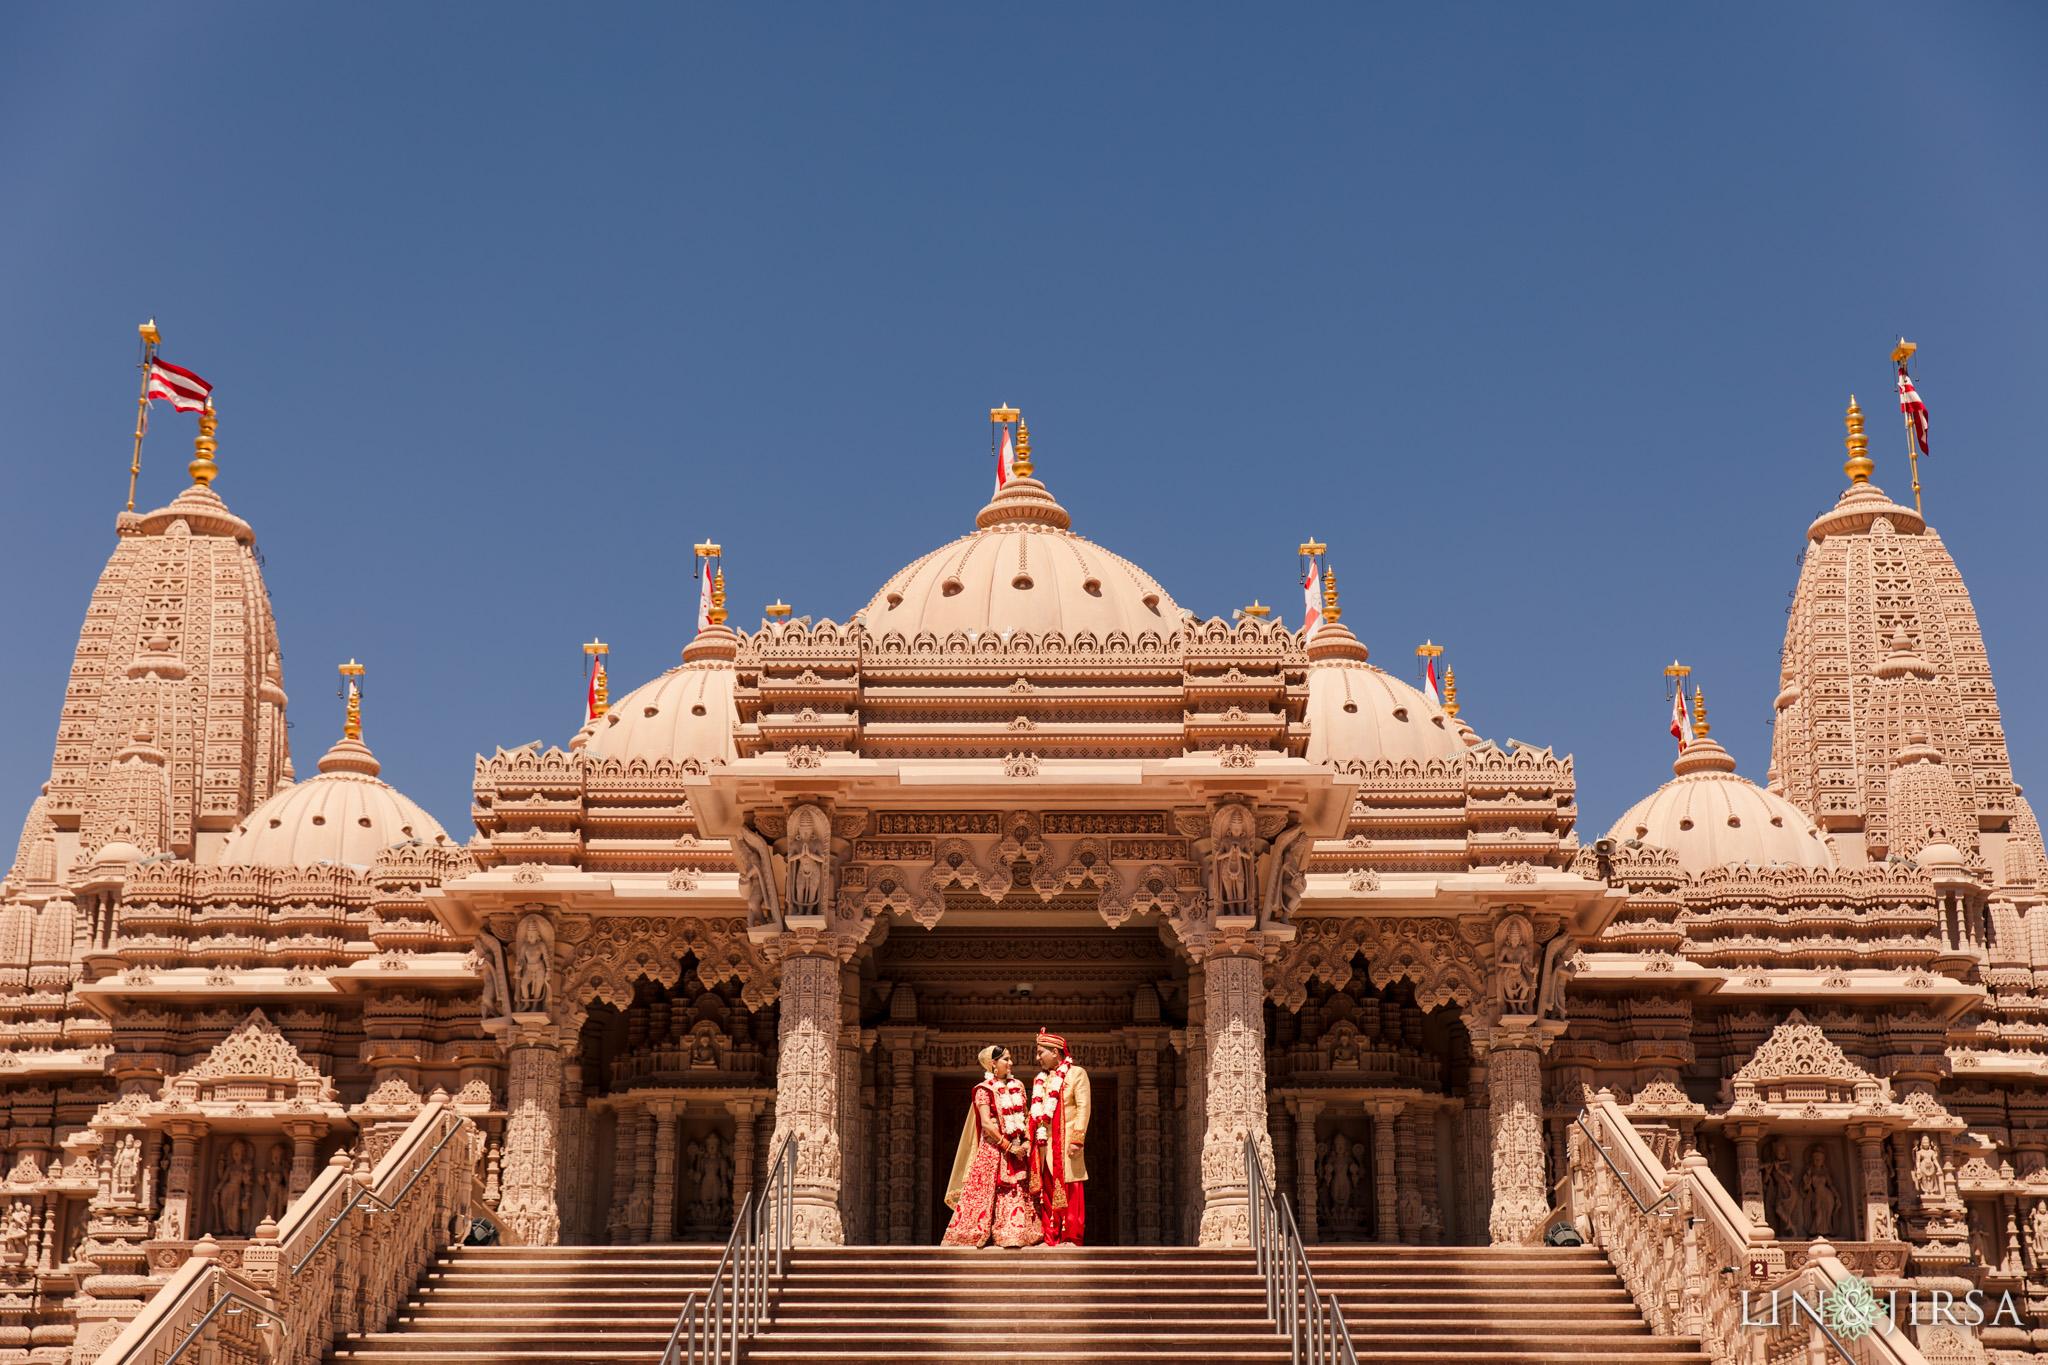 094 Shri Swaminarayan Mandir Chino Hills Indian Wedding Photography